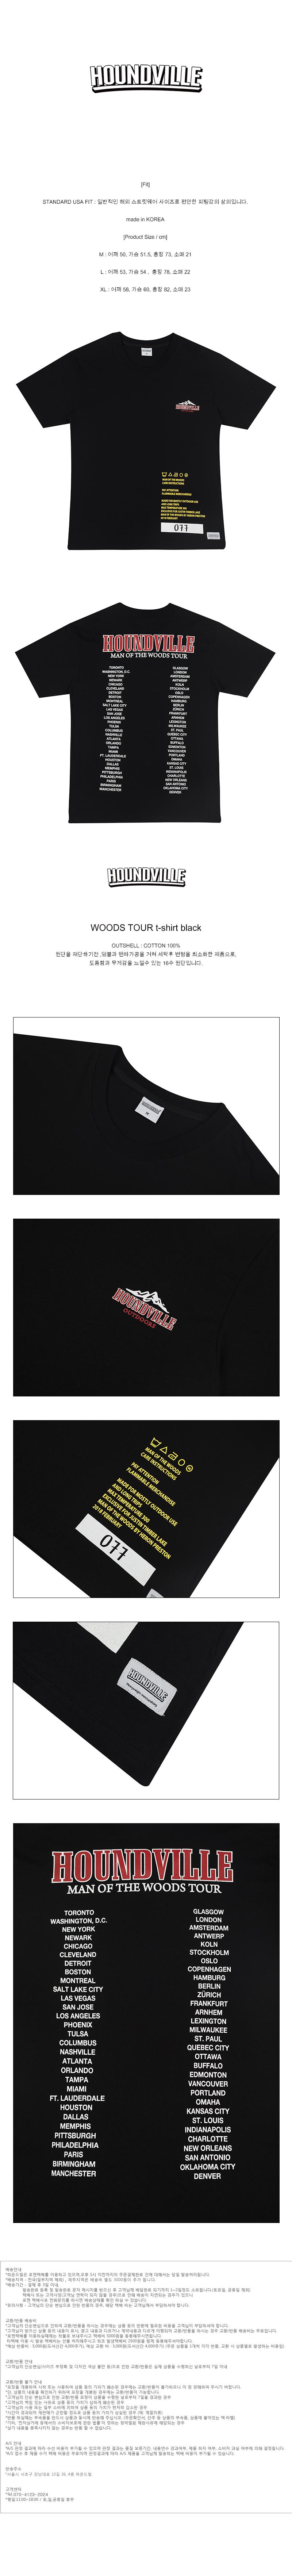 WOODS TOUR t-shirt black.jpg